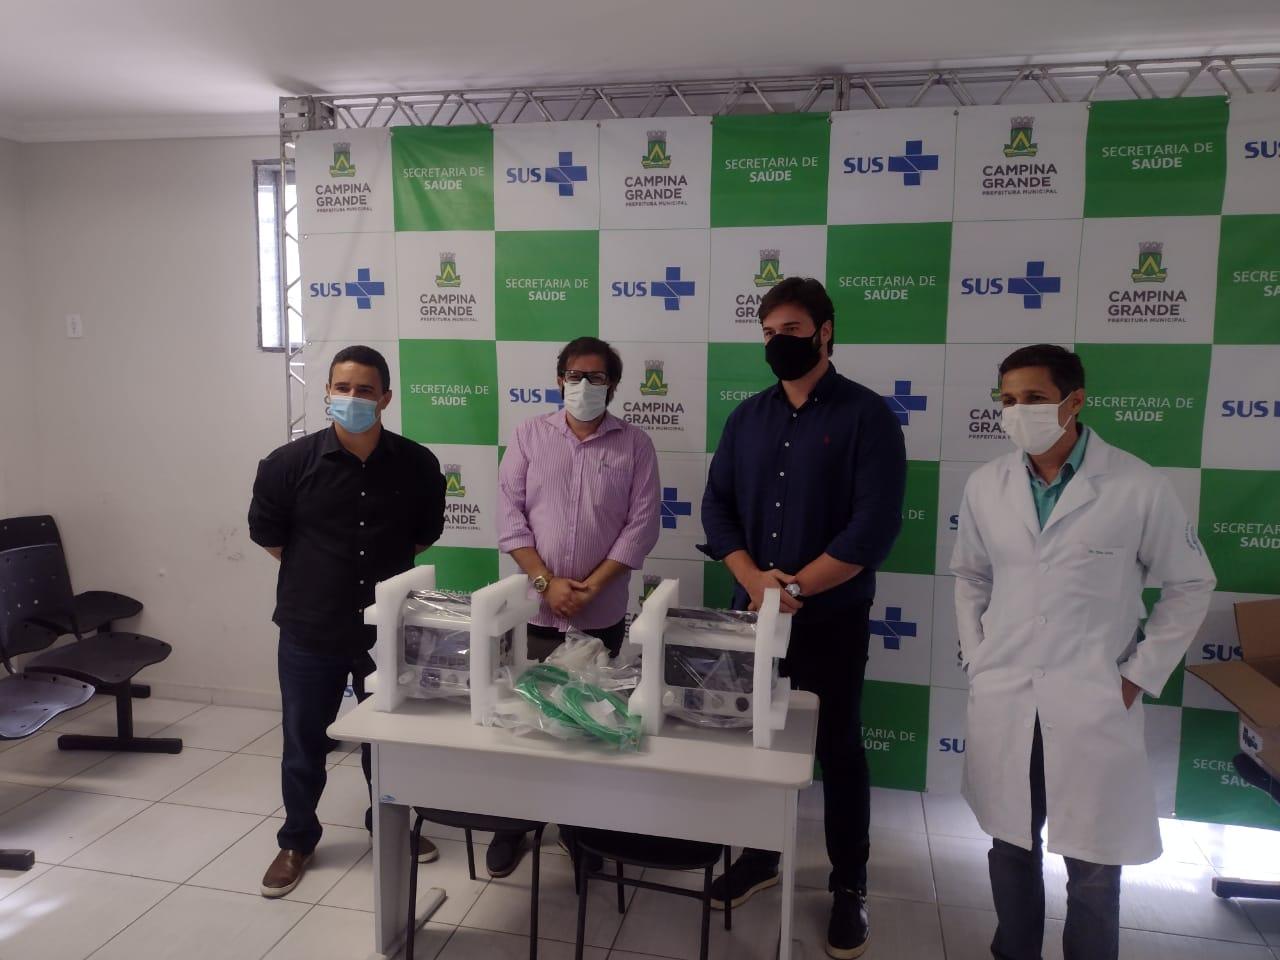 Prefeitura de Solânea cedeu quatro respiradores para ampliar tratamento aos pacientes da covid-19 no Estado da Paraíba.